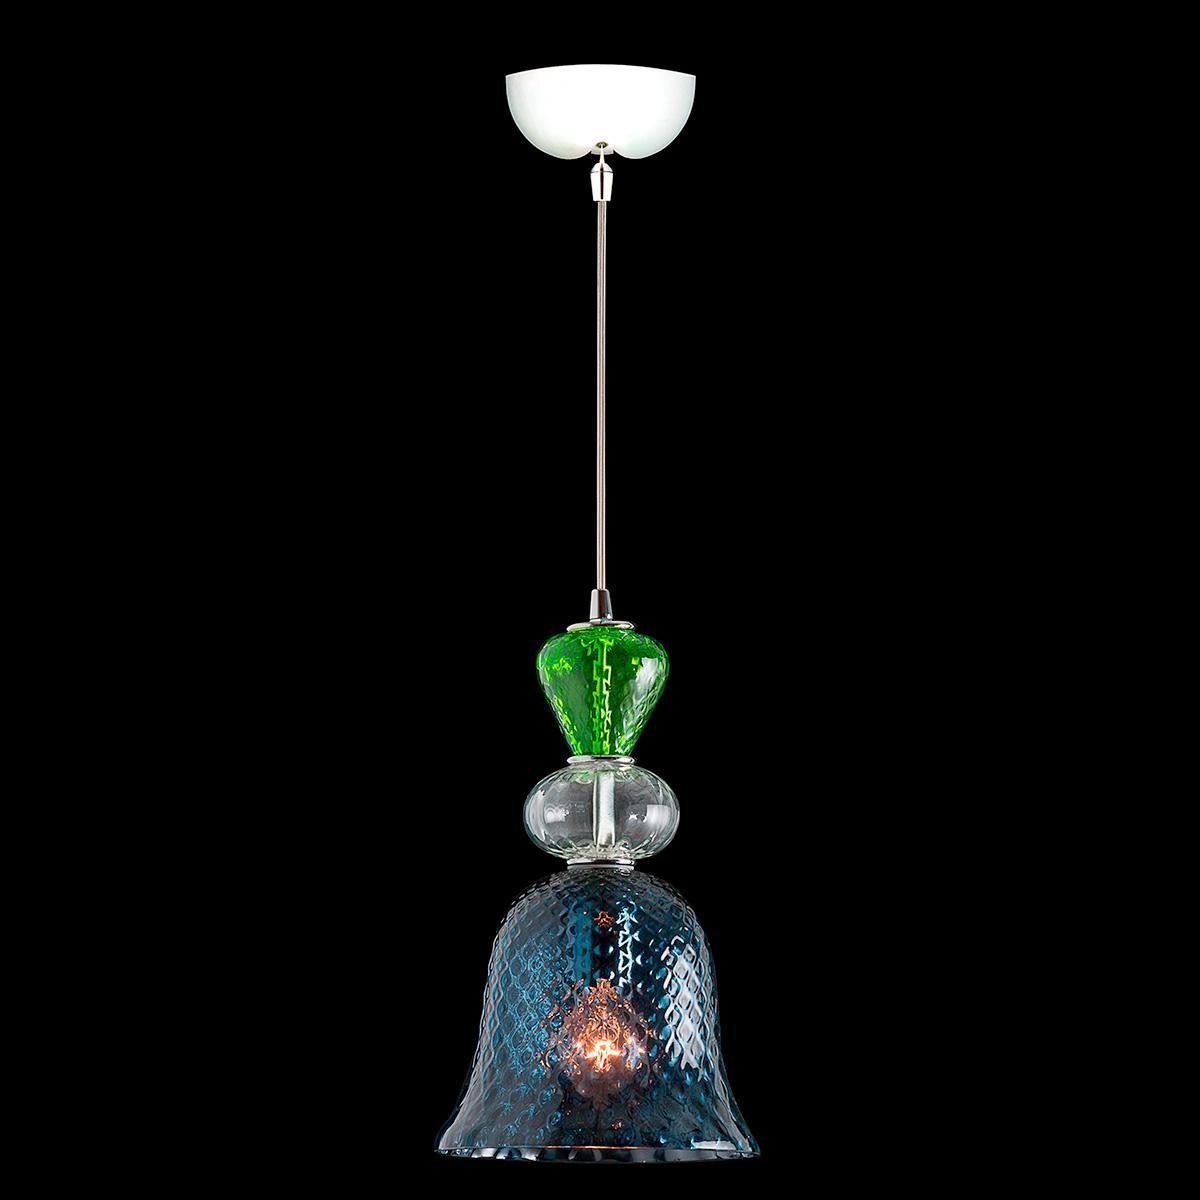 """Herbie"" lámpara colgante en cristal de Murano - 1 luce - multicolore"